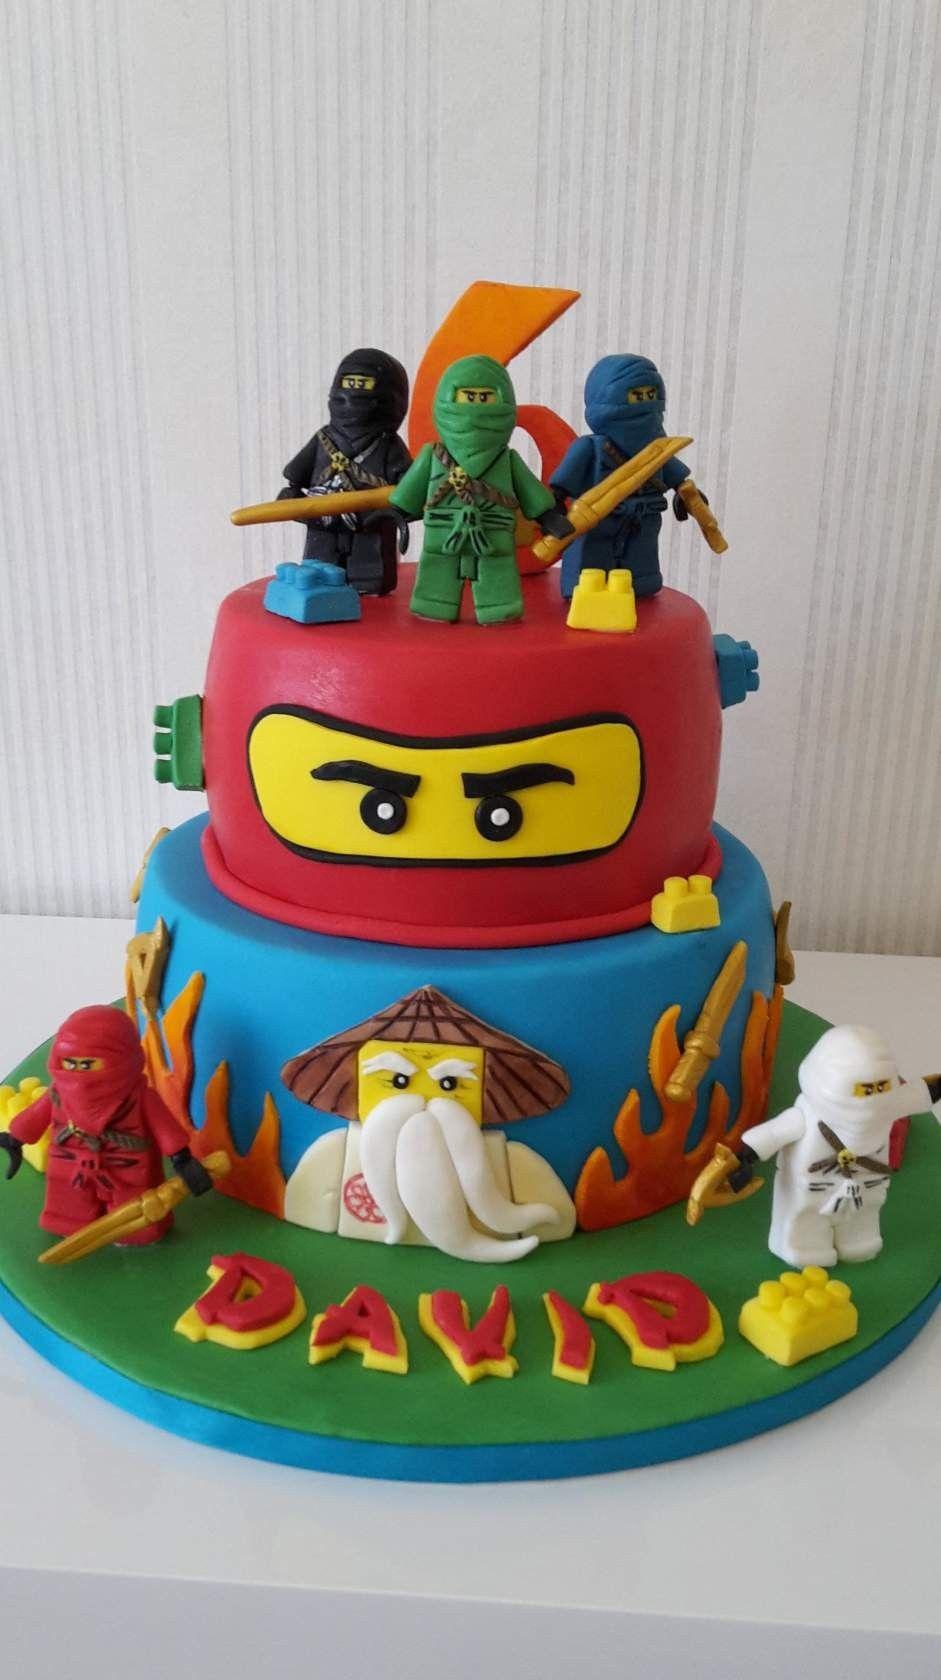 cake design lego ninjago Ninjago  Desserts, Cake, Birthday cake